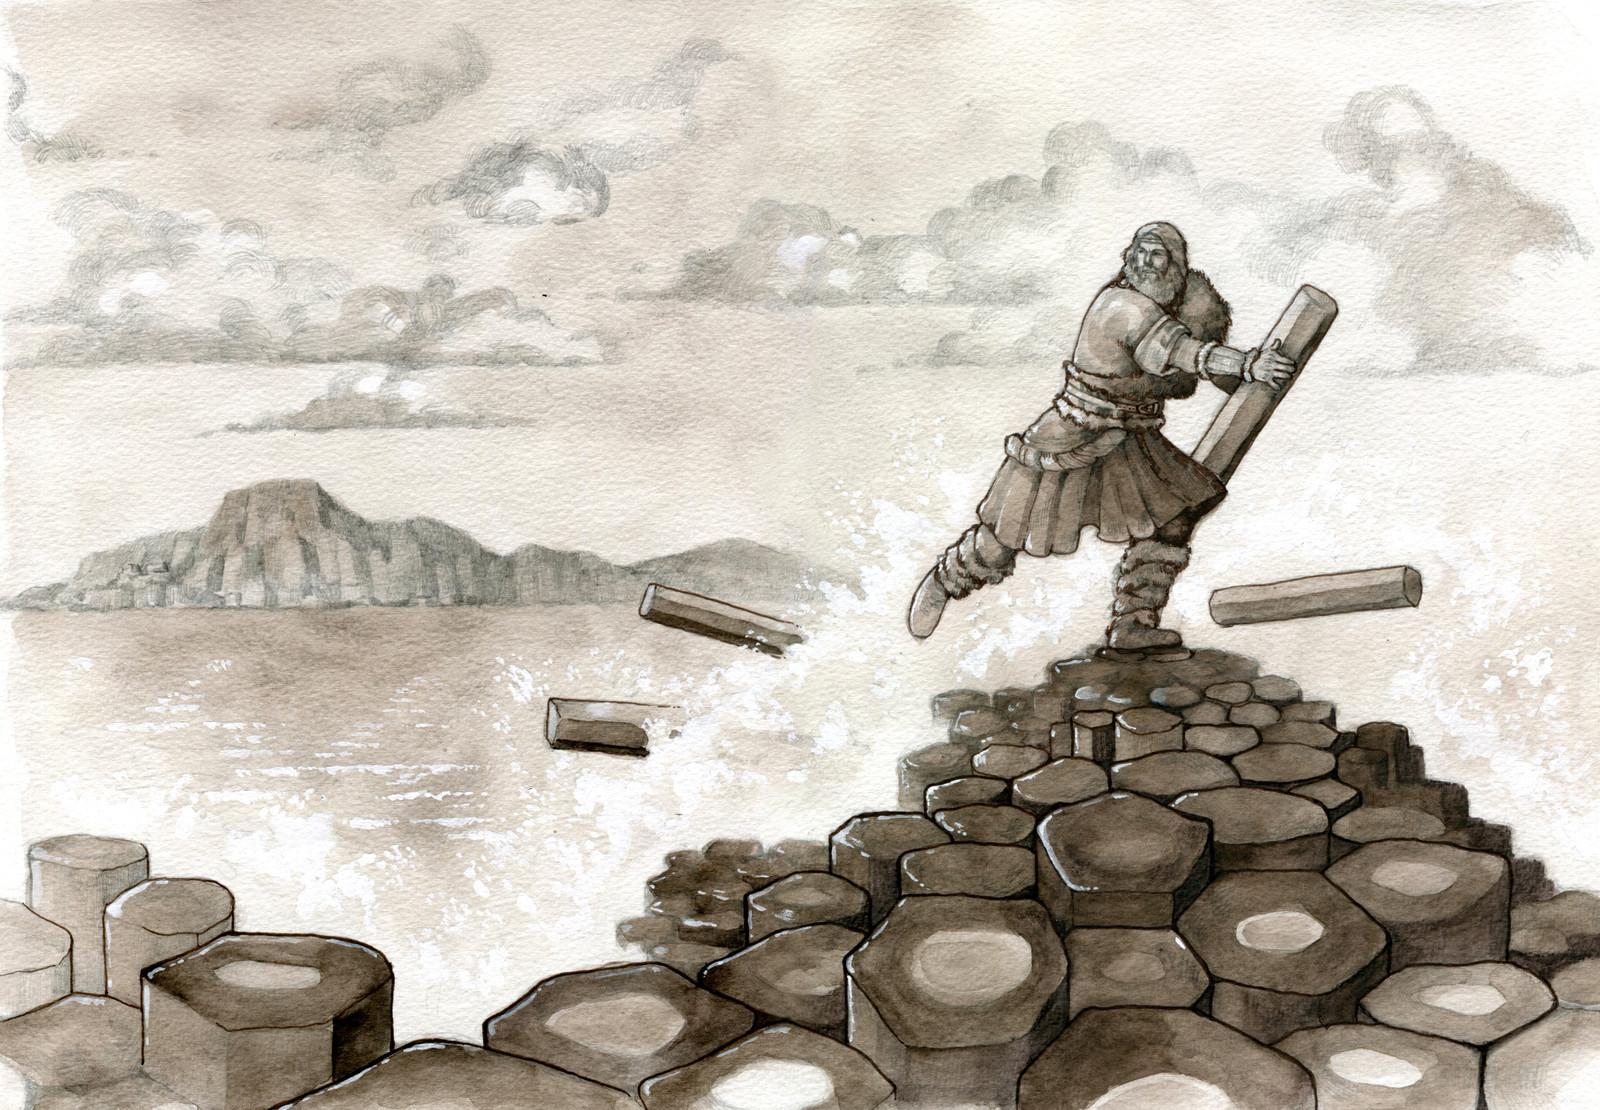 Last scene: Benanndonner destroys the causeway